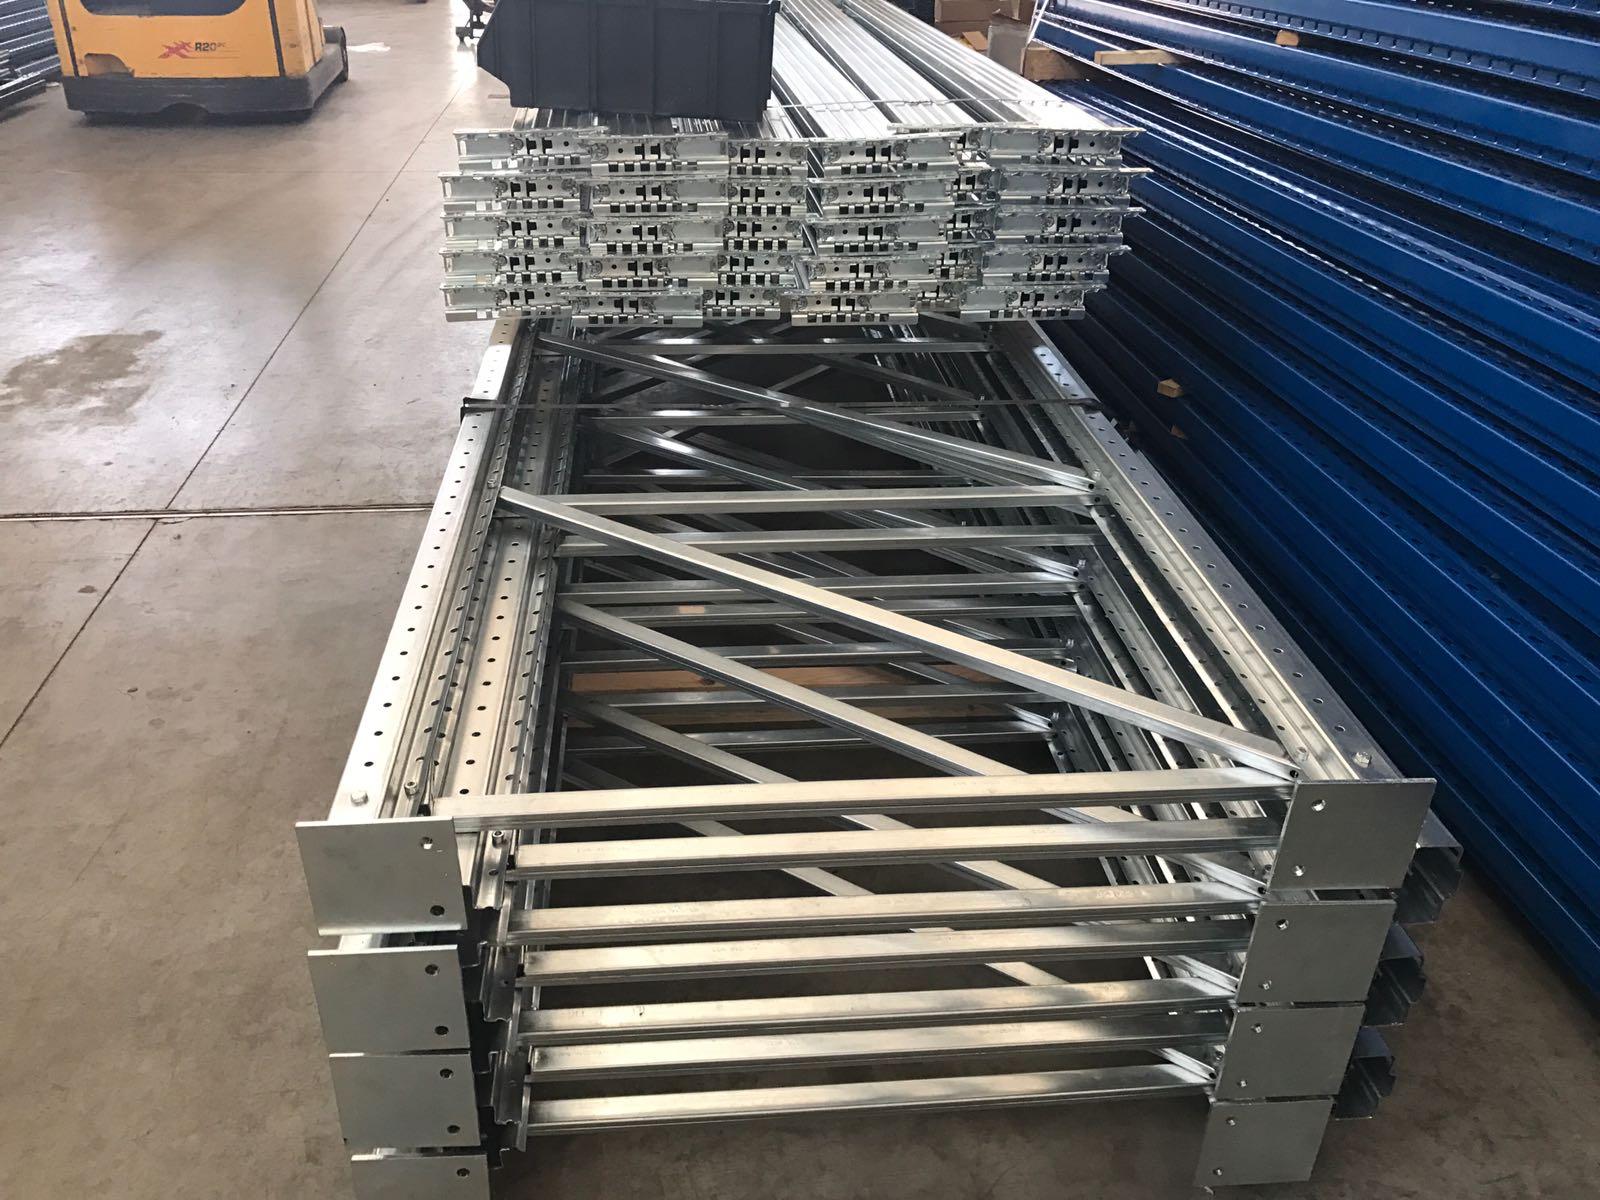 Scaffali Industriali Portapallet.Scaffalature Portapallet H 6 L 21 84 Posti Pallet Portata 1000kg Bancale